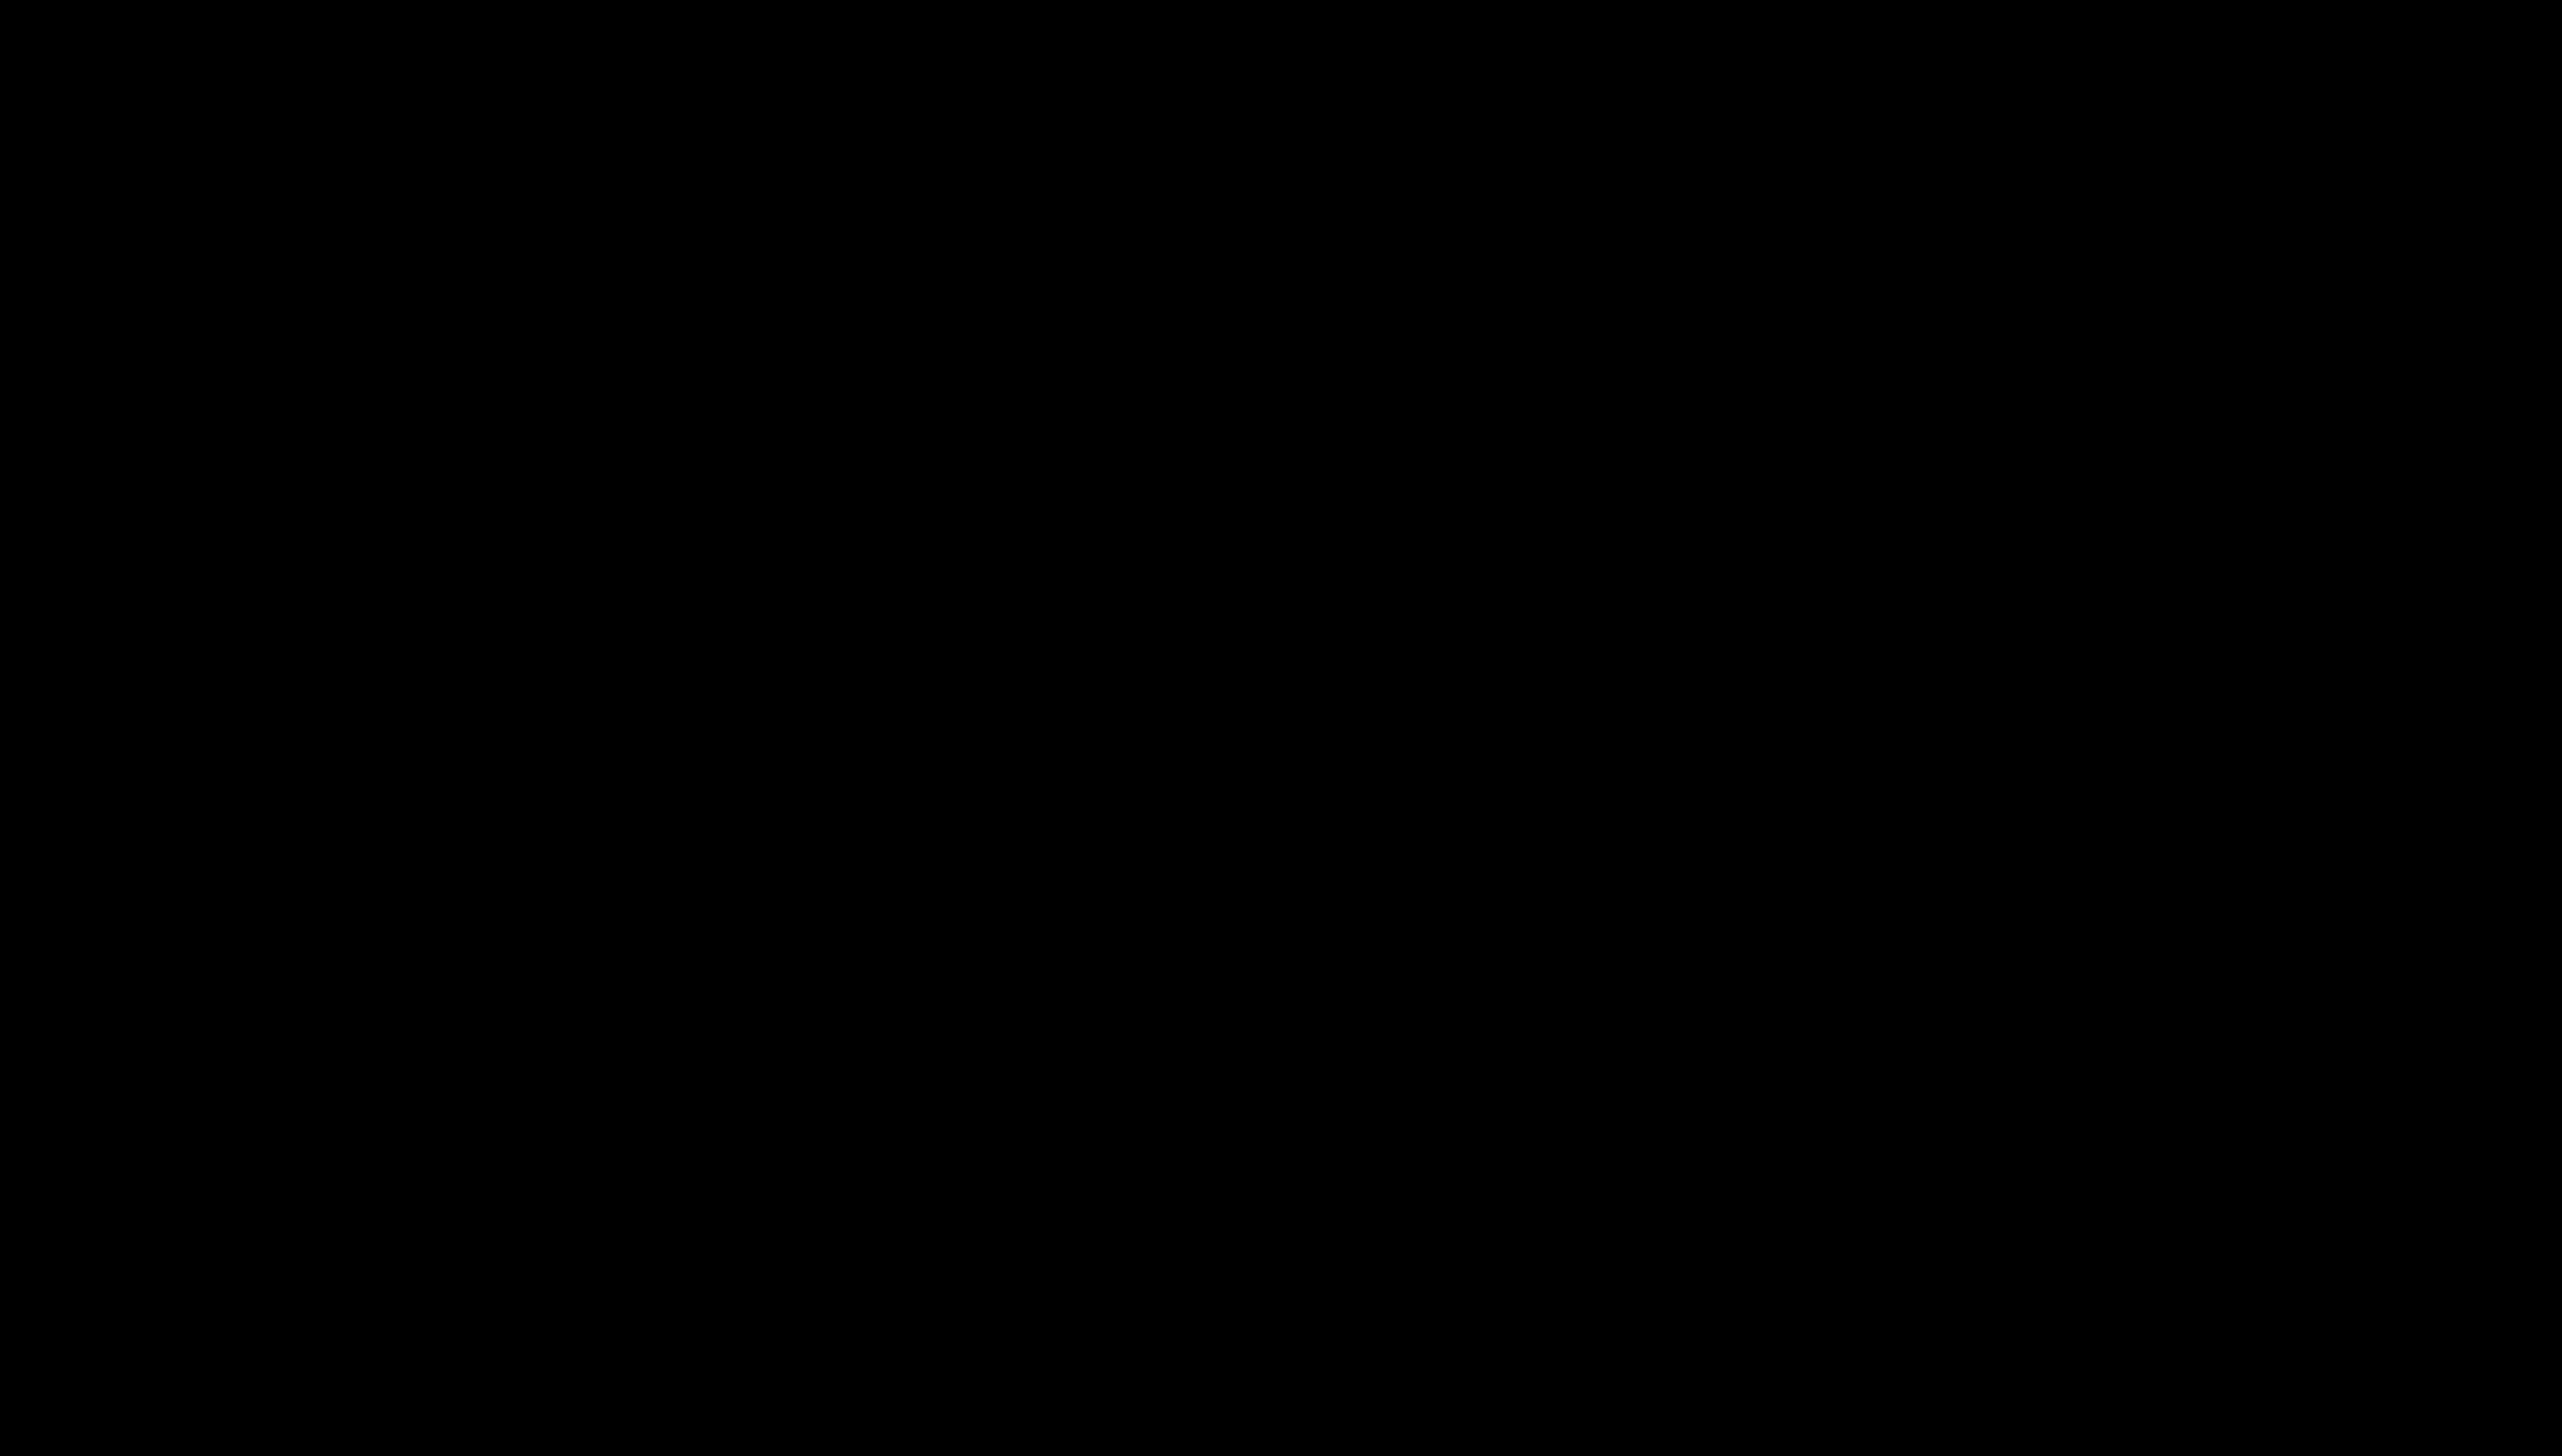 SIMONE RAINER